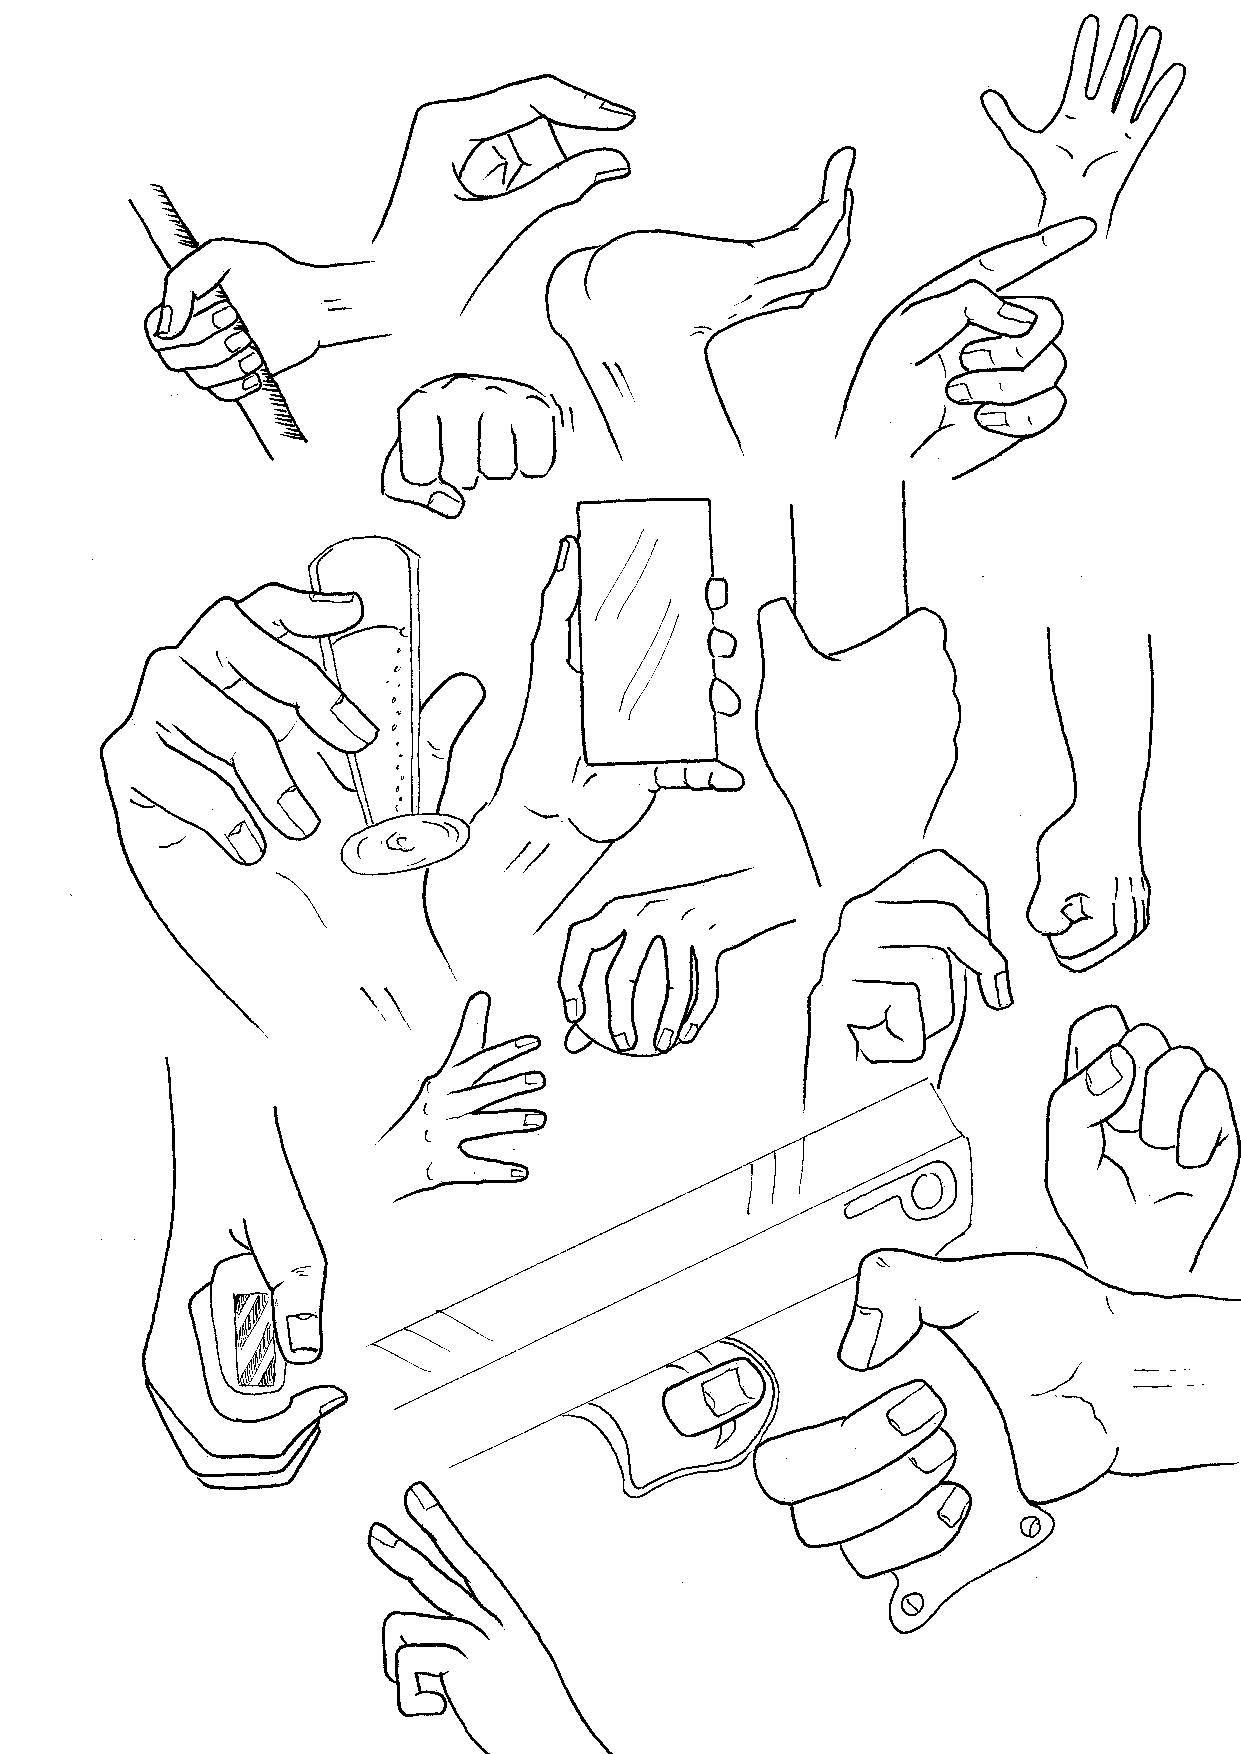 1241x1754 Drawn Fist Open Hand